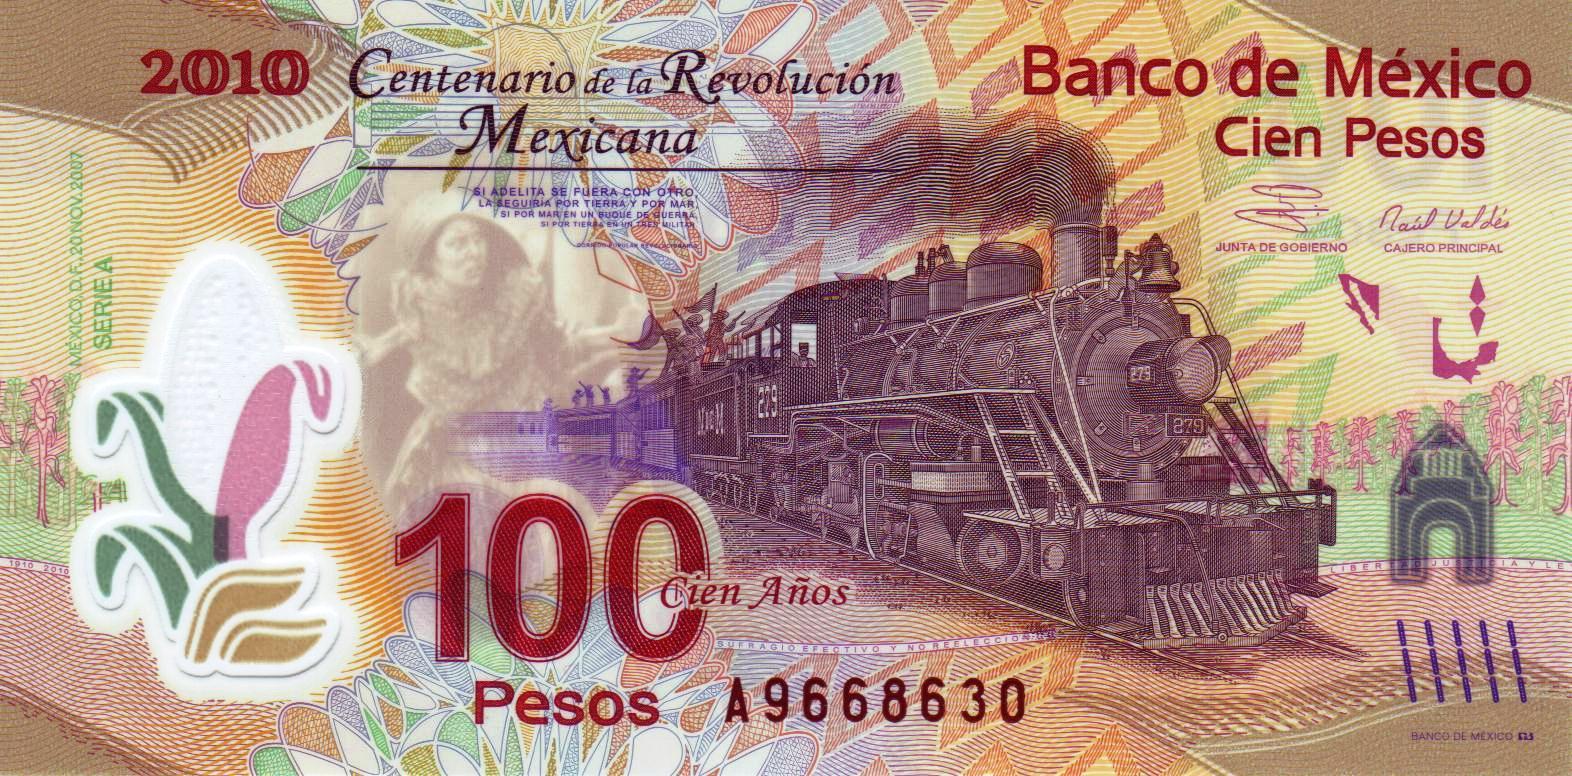 http://4.bp.blogspot.com/_IVib63ZbpdQ/TOS0f2DzR-I/AAAAAAAAB24/jIuER-KgeOM/s1600/Billete+de+100+pesos+con+adelita+inclu%25C3%25ADda.jpg